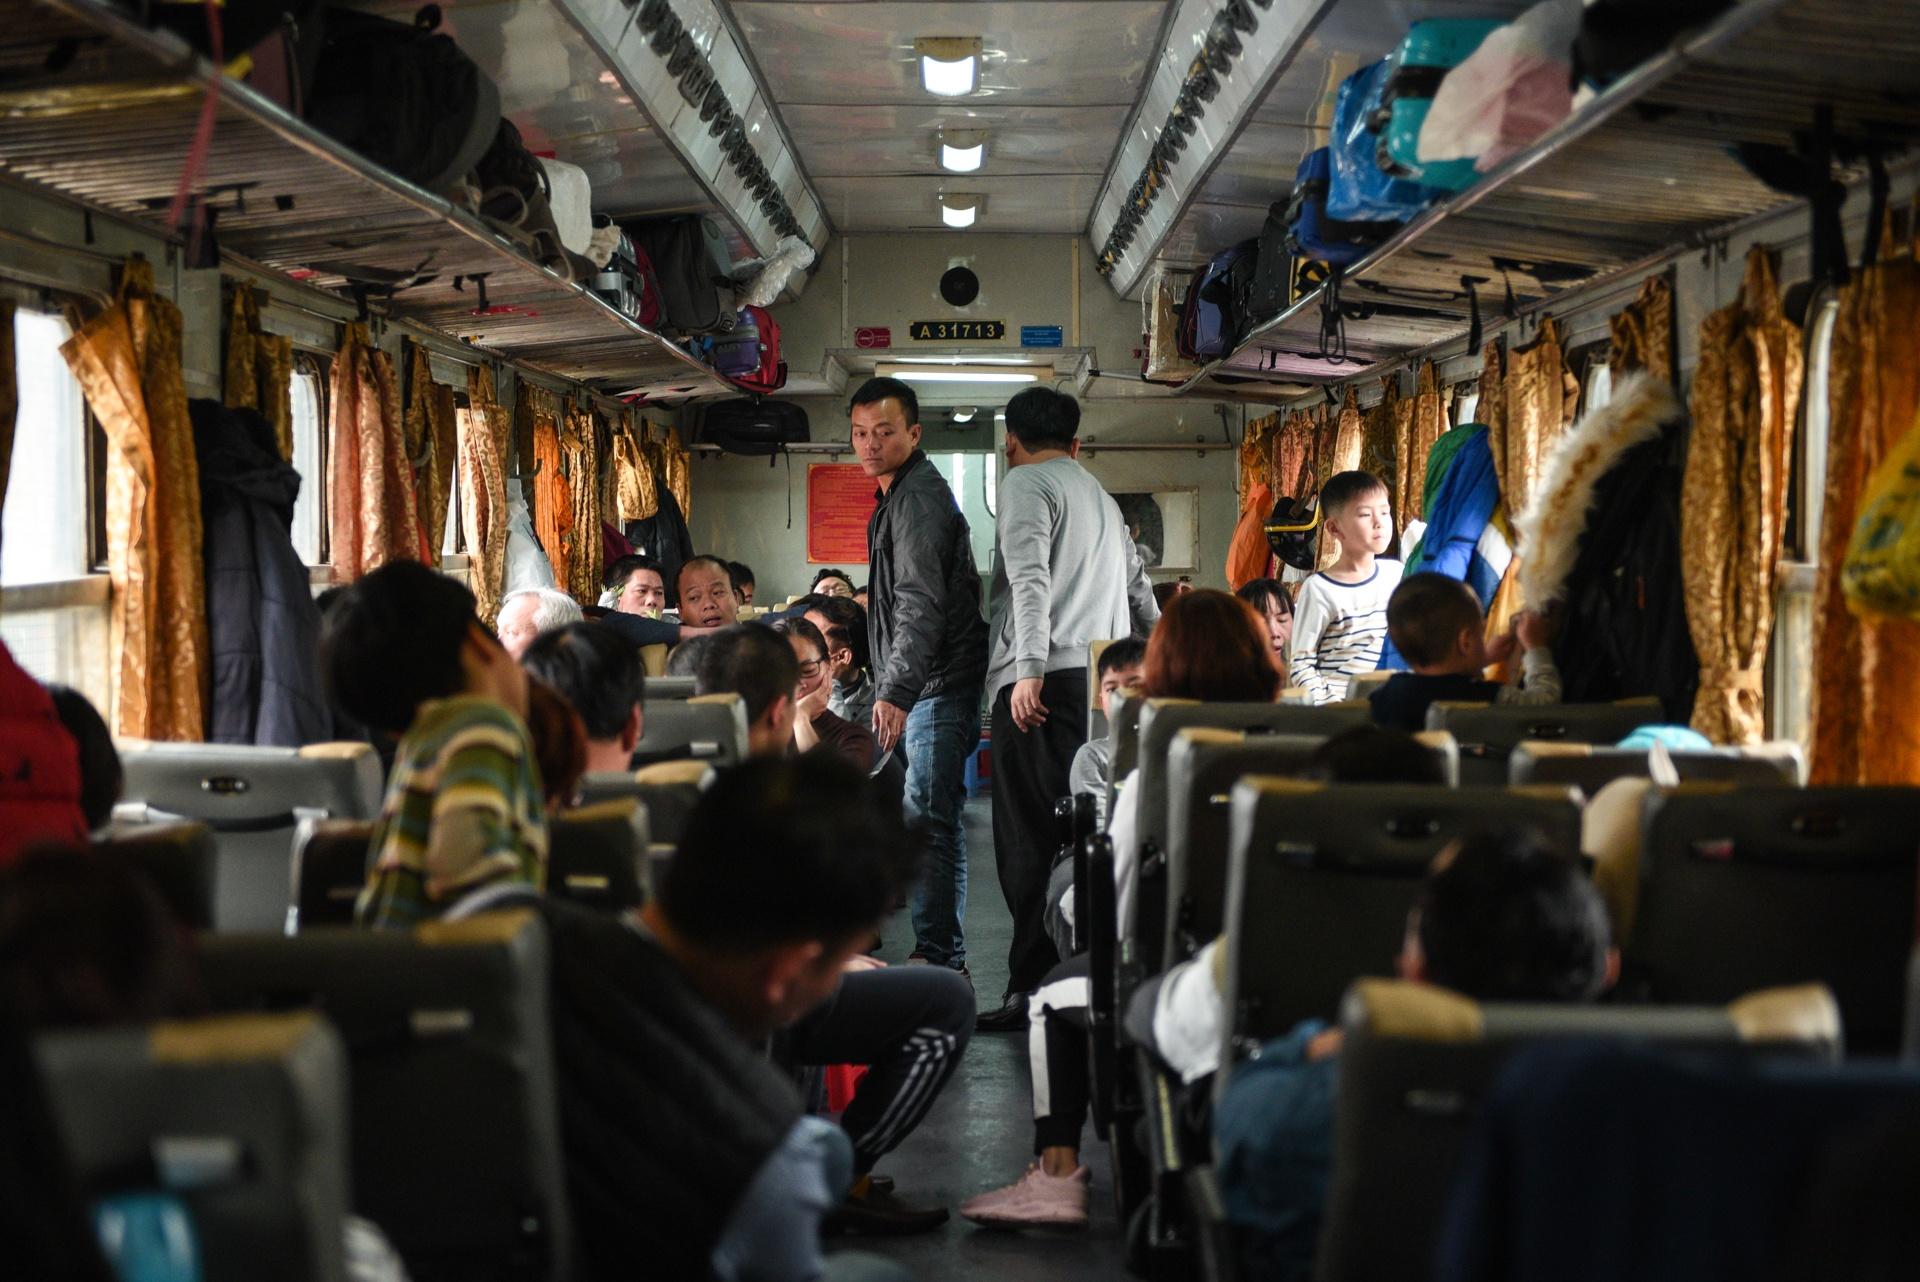 Tet tren nhung chuyen tau cuoi cung cua nam Ky Hoi hinh anh 25 DSC_2471_zing.jpg